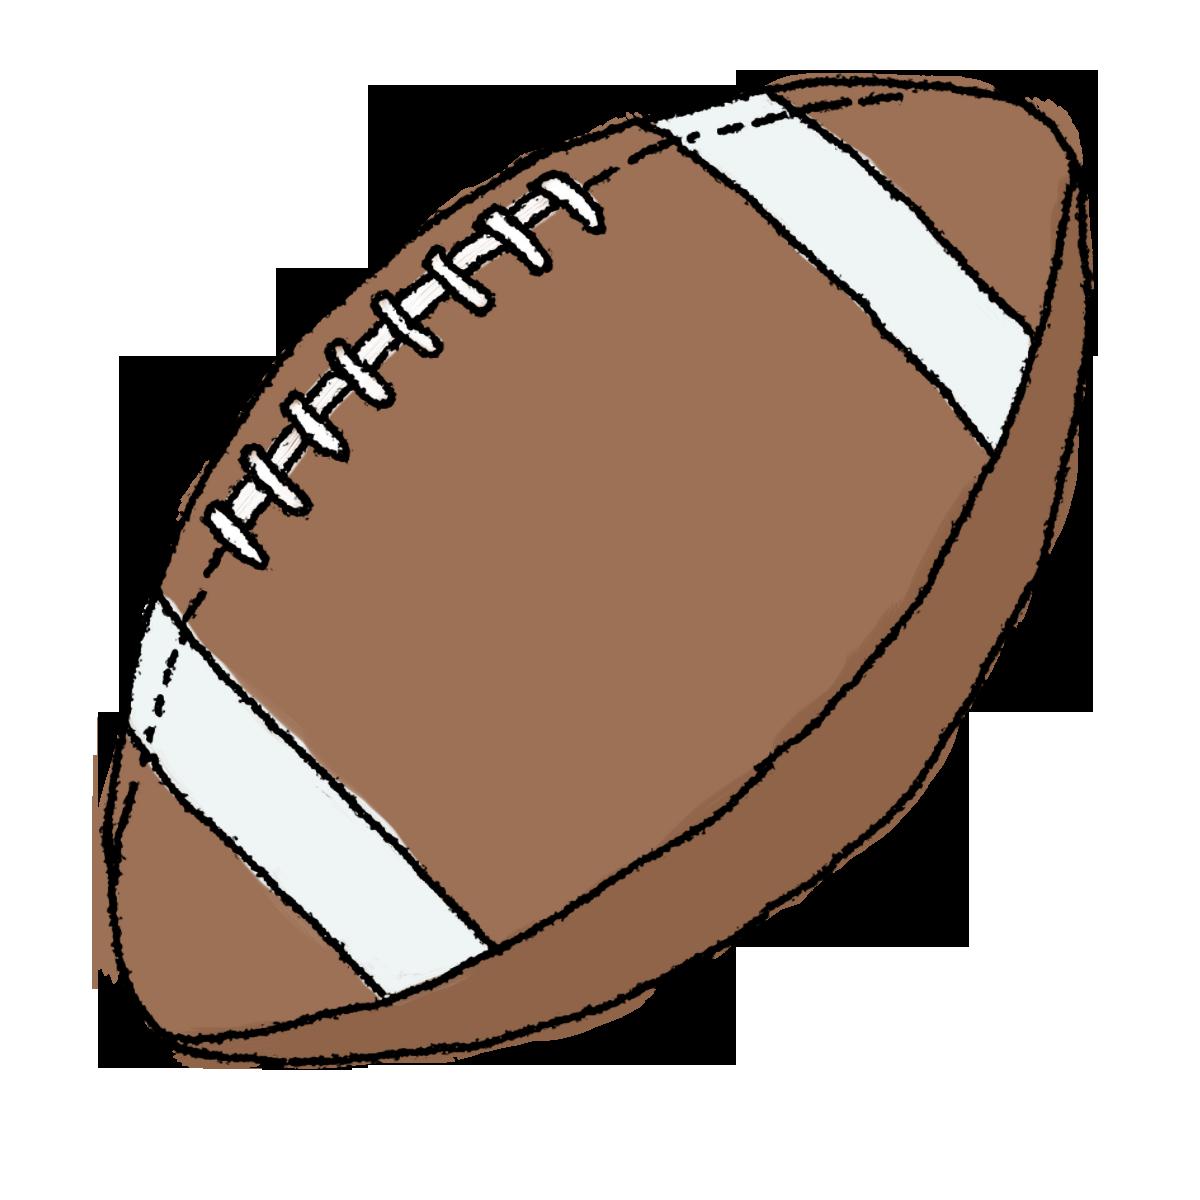 Free Super Bowl Cliparts, Download Free Clip Art, Free Clip.